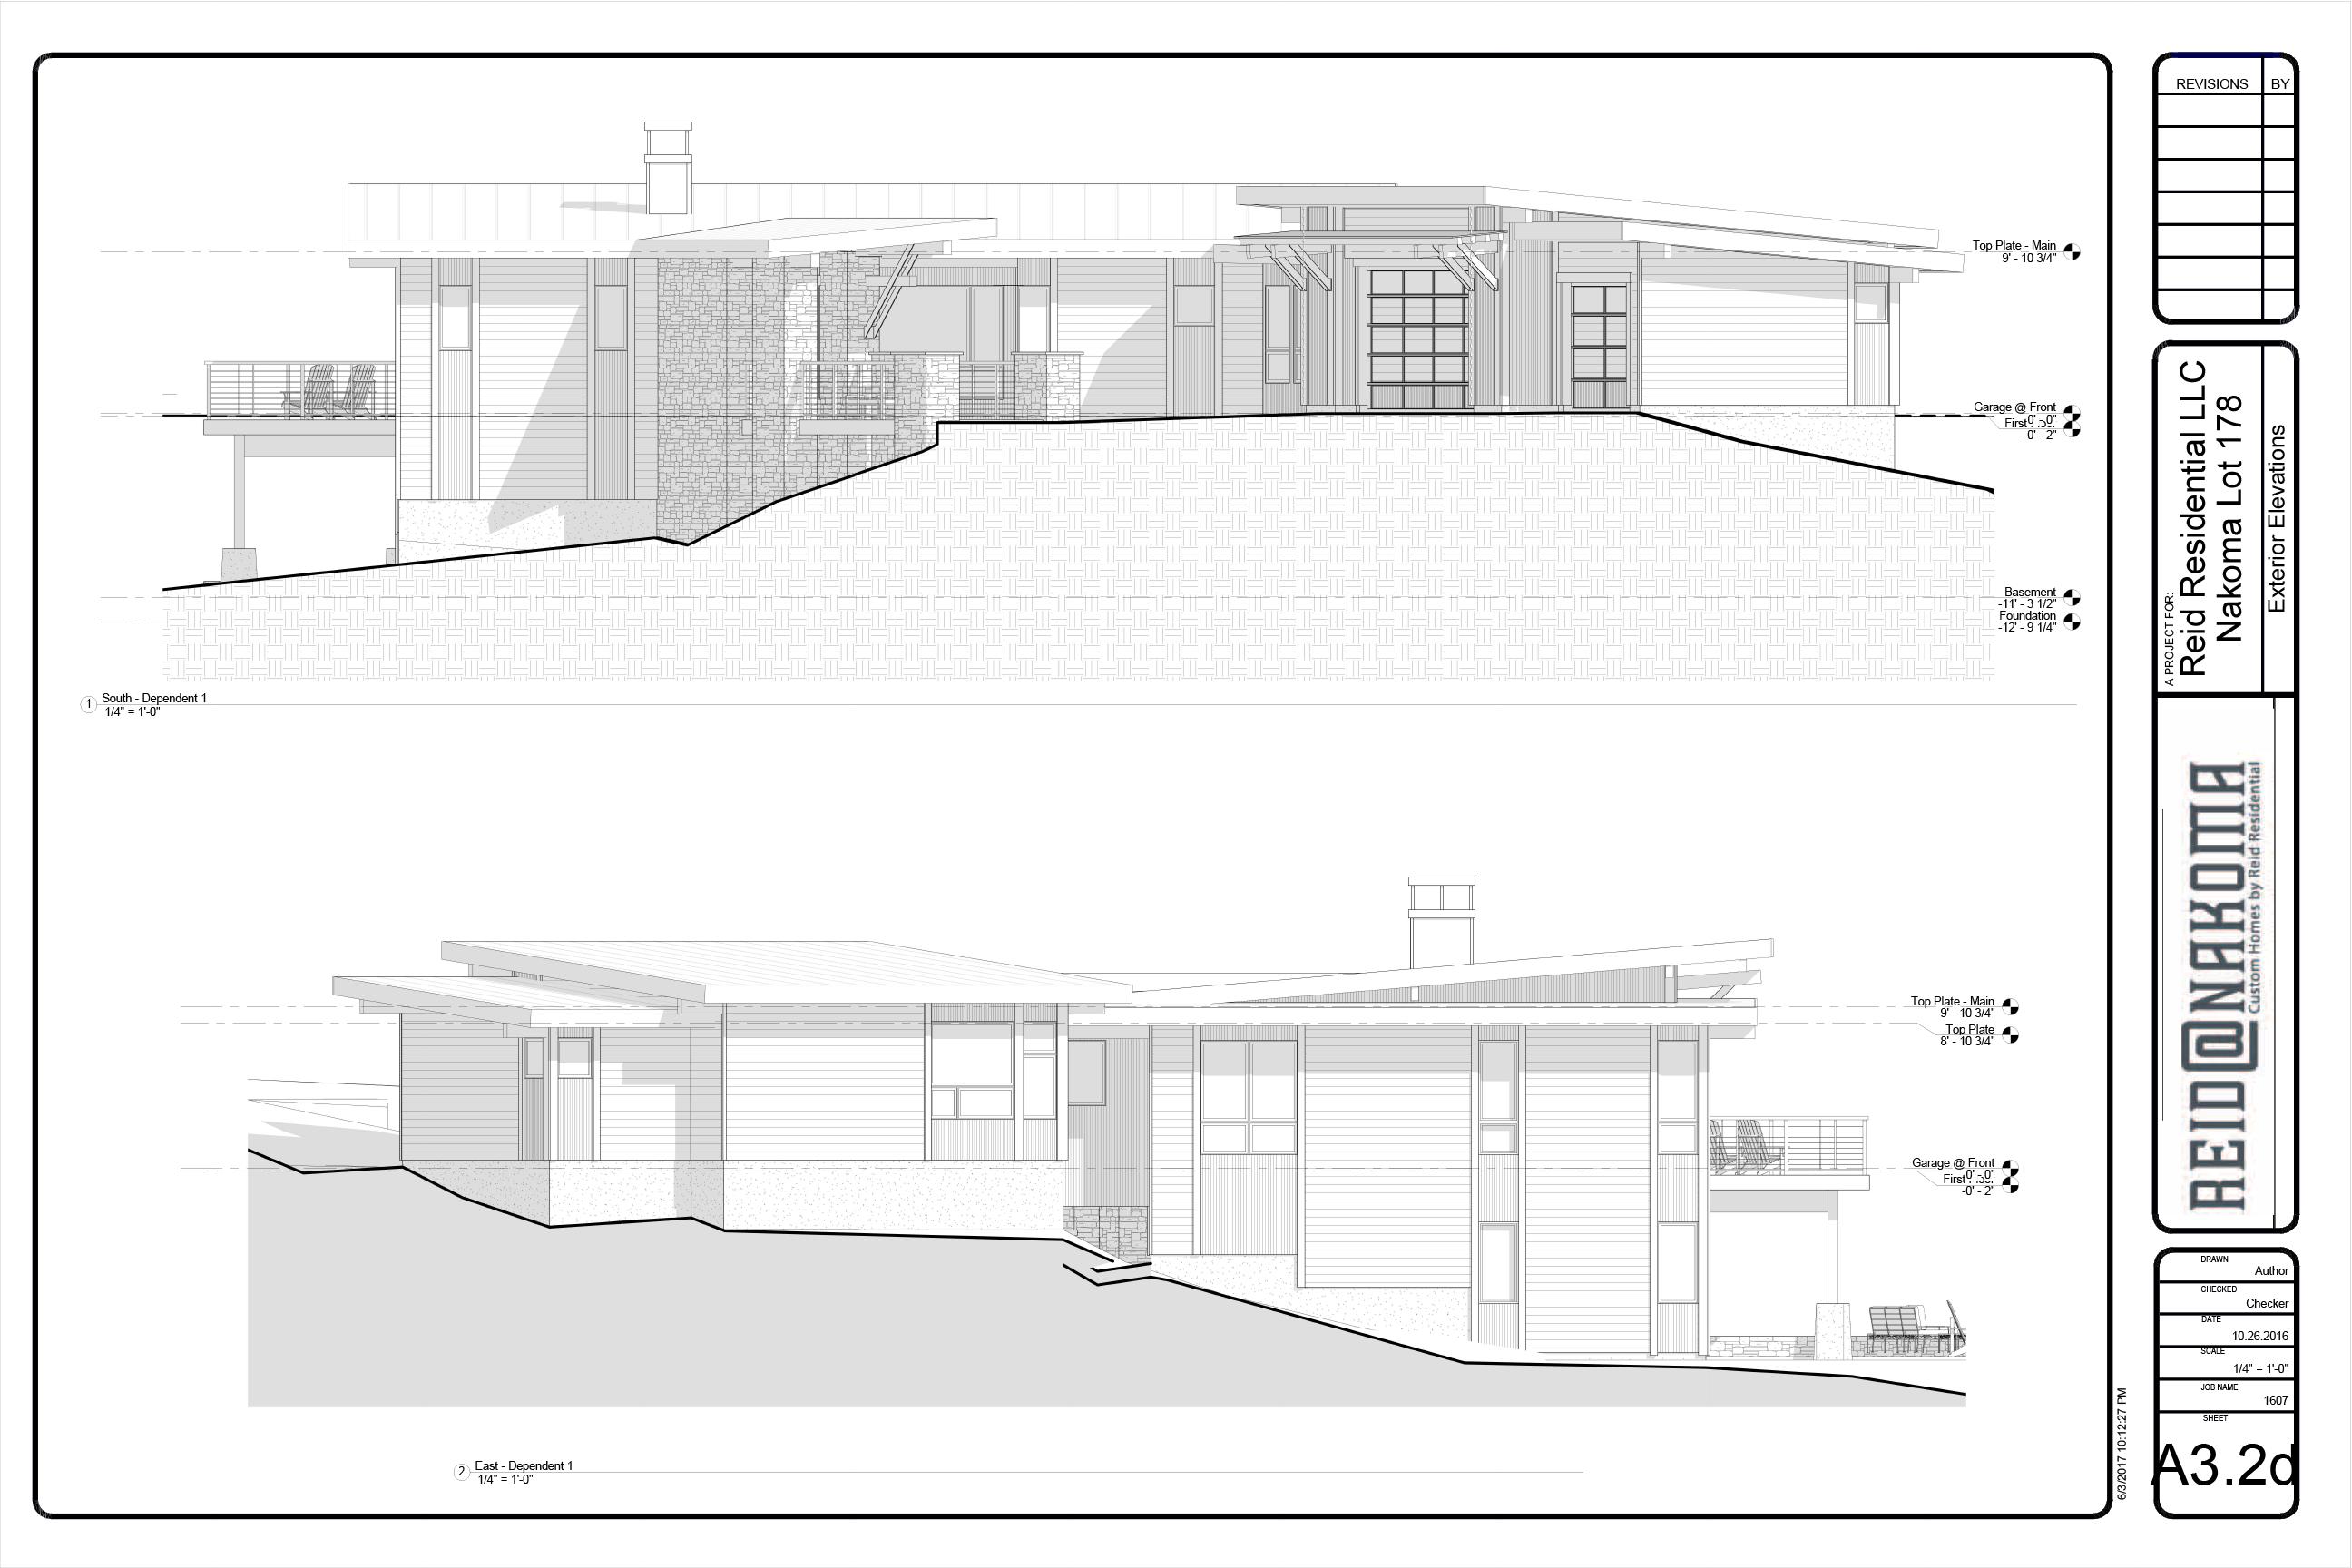 Nakoma_Lot178_Architectural 5